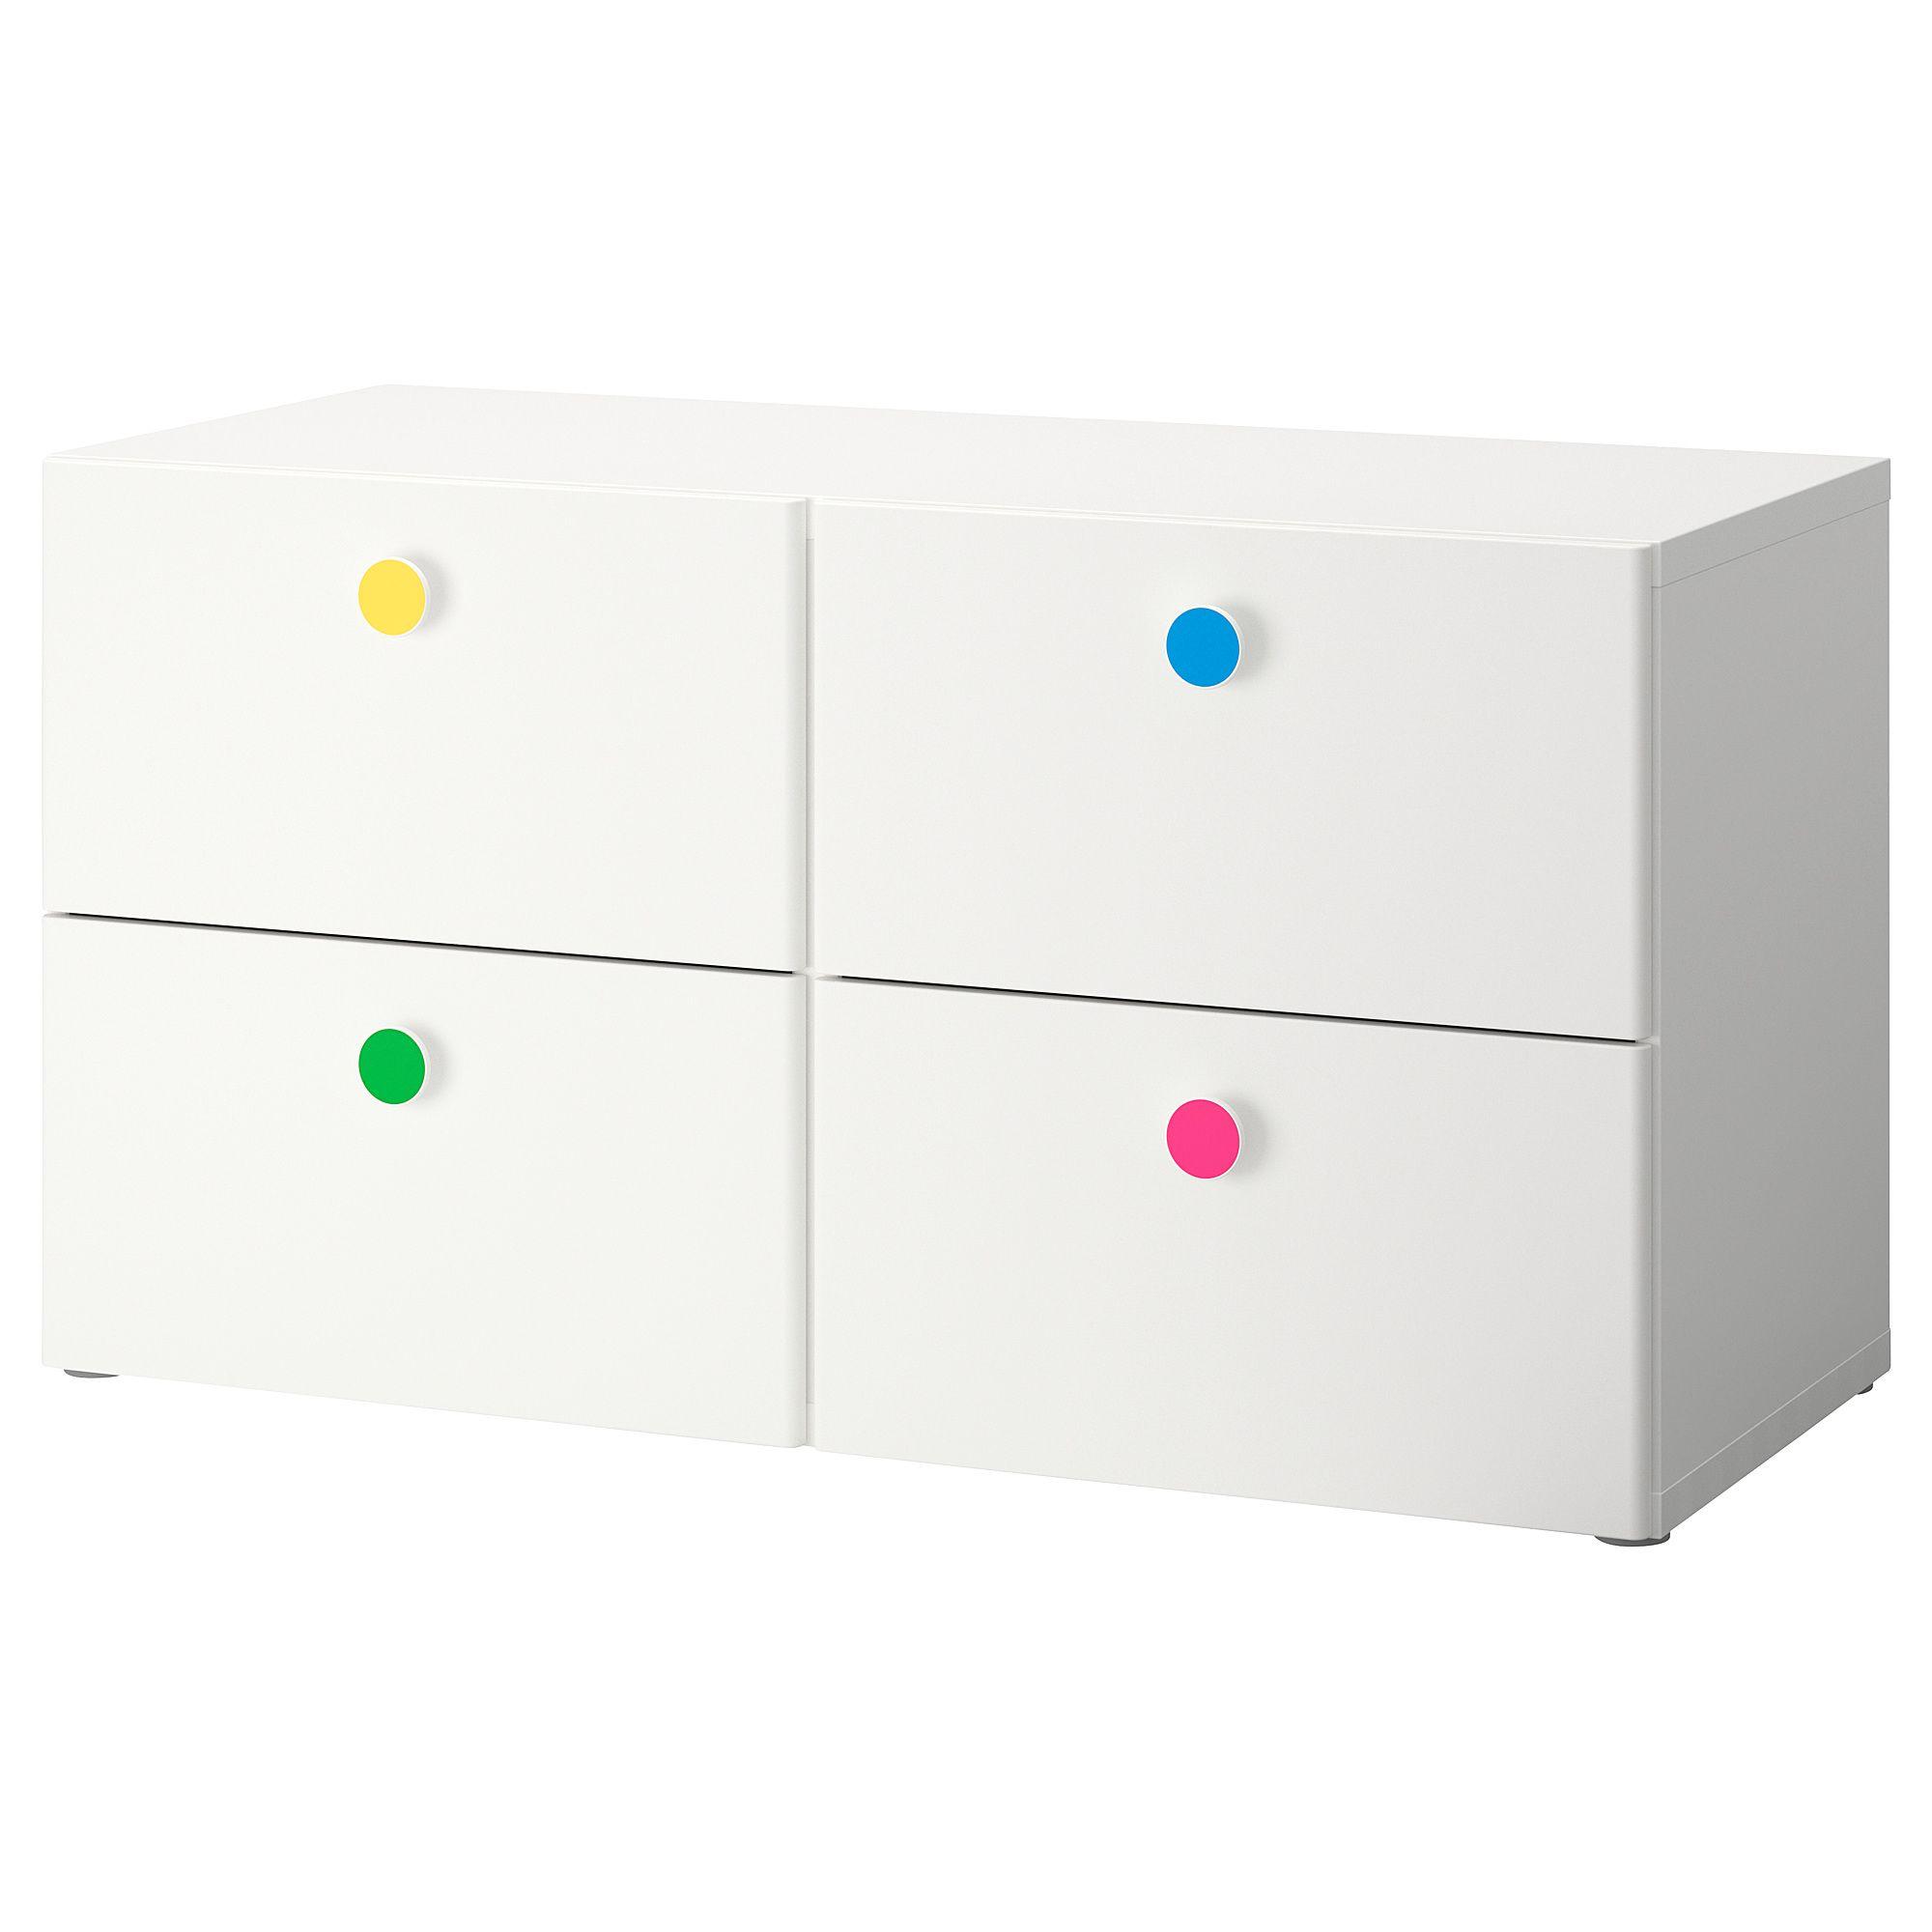 IKEA - STUVA / FÖLJA 4-drawer dresser white   Talia   Ikea 4